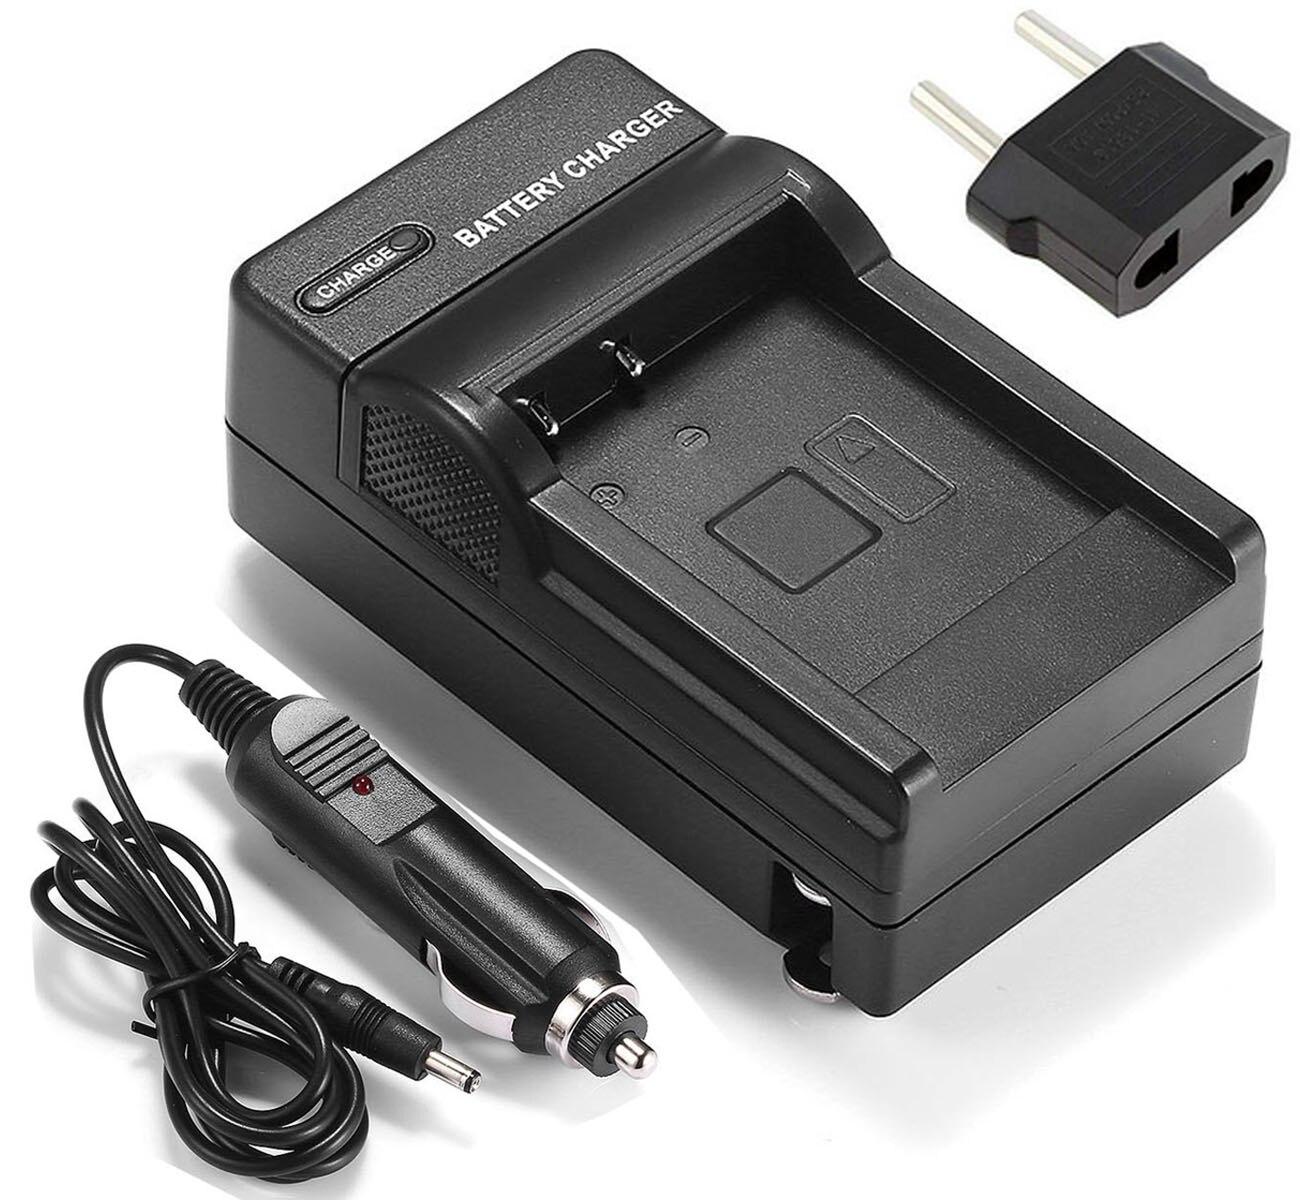 Cargador de batería para Sony Alpha SLT-A33, SLT-A35, SLT-A37, SLT-A55, SLT-A55V, SLT-A55VL cámara Digital SLR